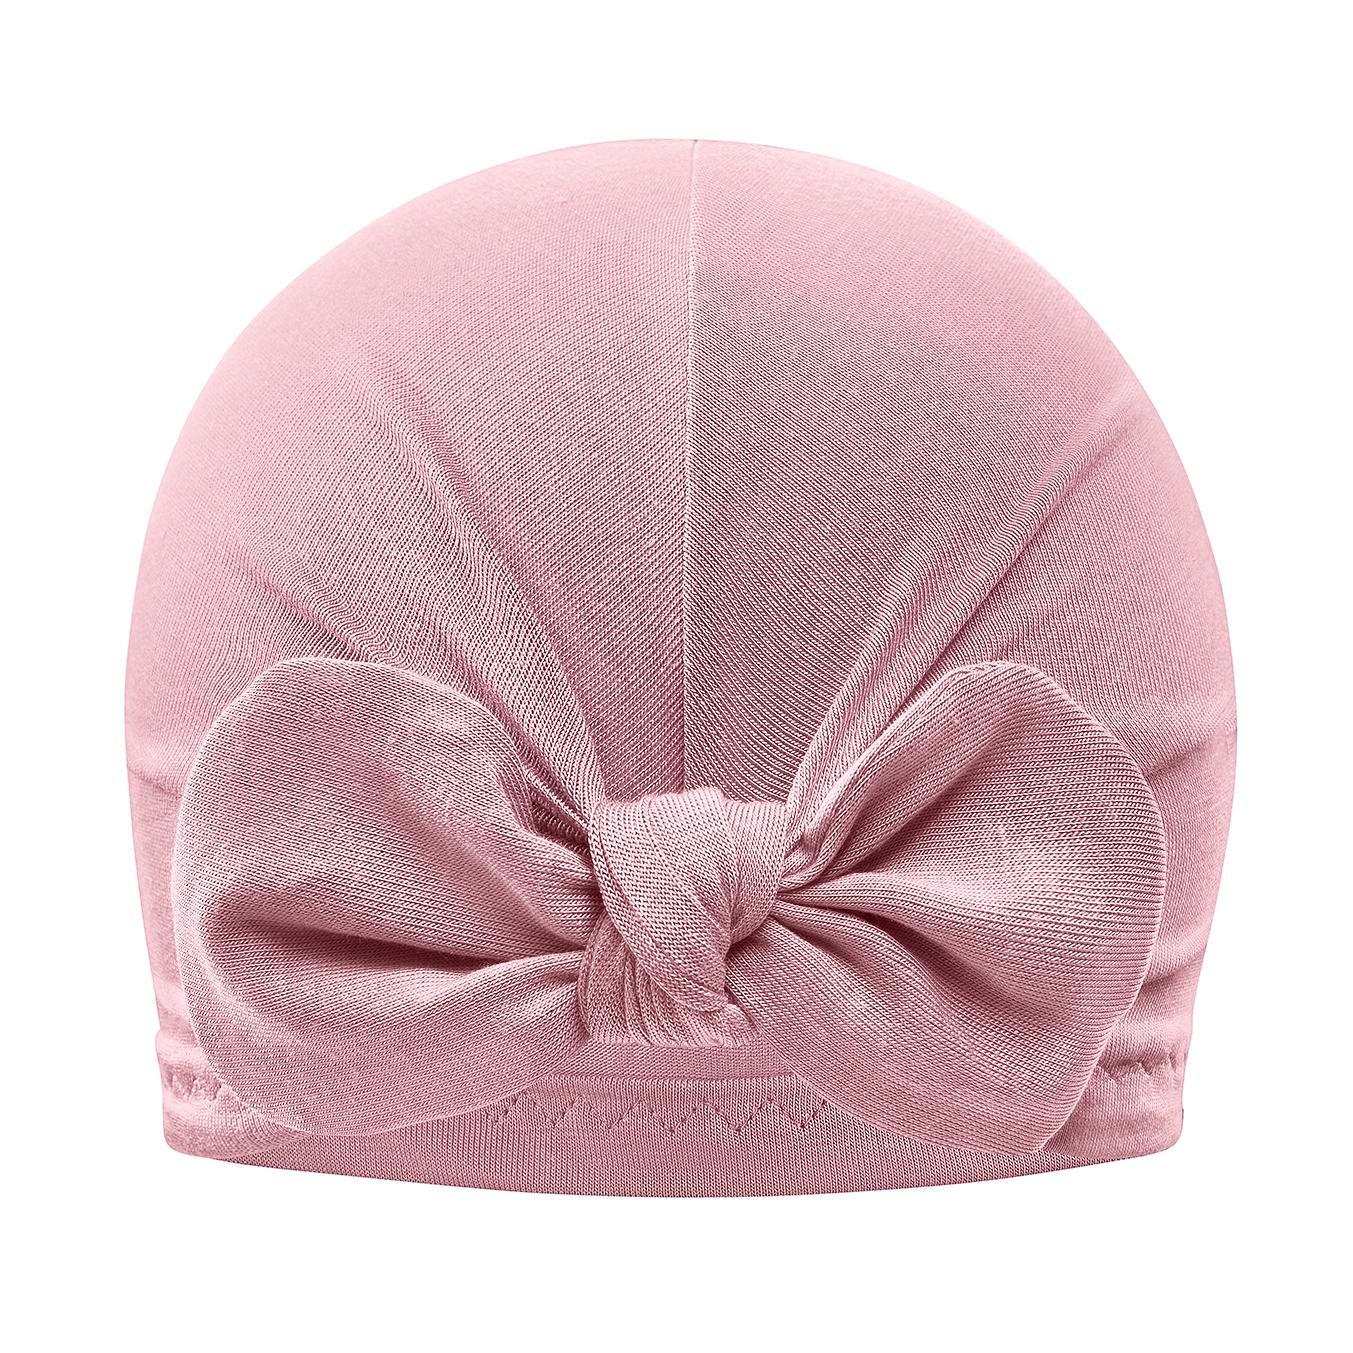 Dječji turban MAYLILY, blush pink